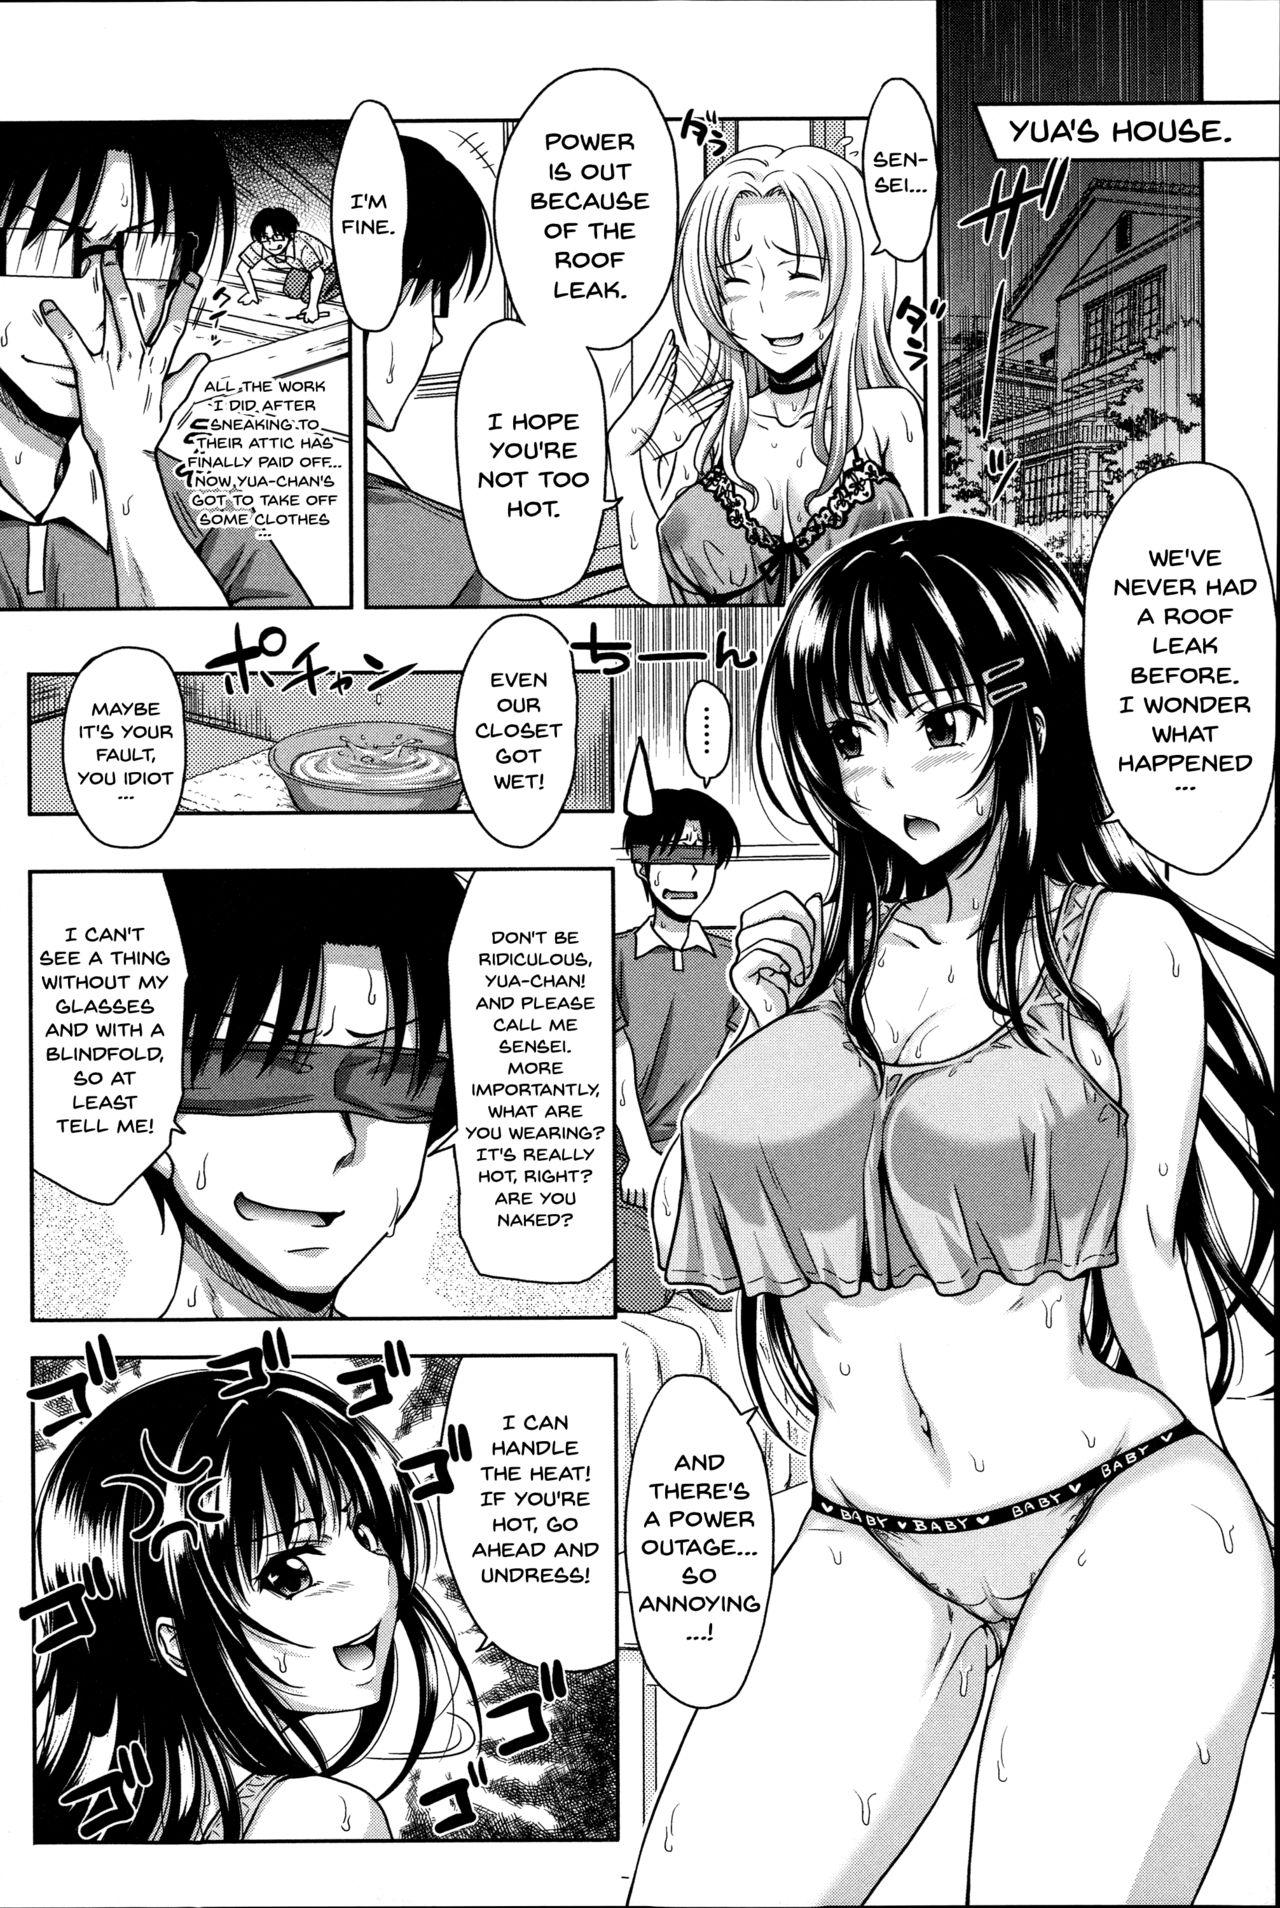 [Takuwan] Pakotate! Seikouritsu 0% no Teppeki Bishojo VS Seikouritsu 100% no Hentai Katei Kyoushi   Pakotate! Sex Rate 0% Iron-Willed Beautiful Virgins VS Sex Rate 100% Perverted Coach Ch.1-5 [English] {Doujins.com} 62